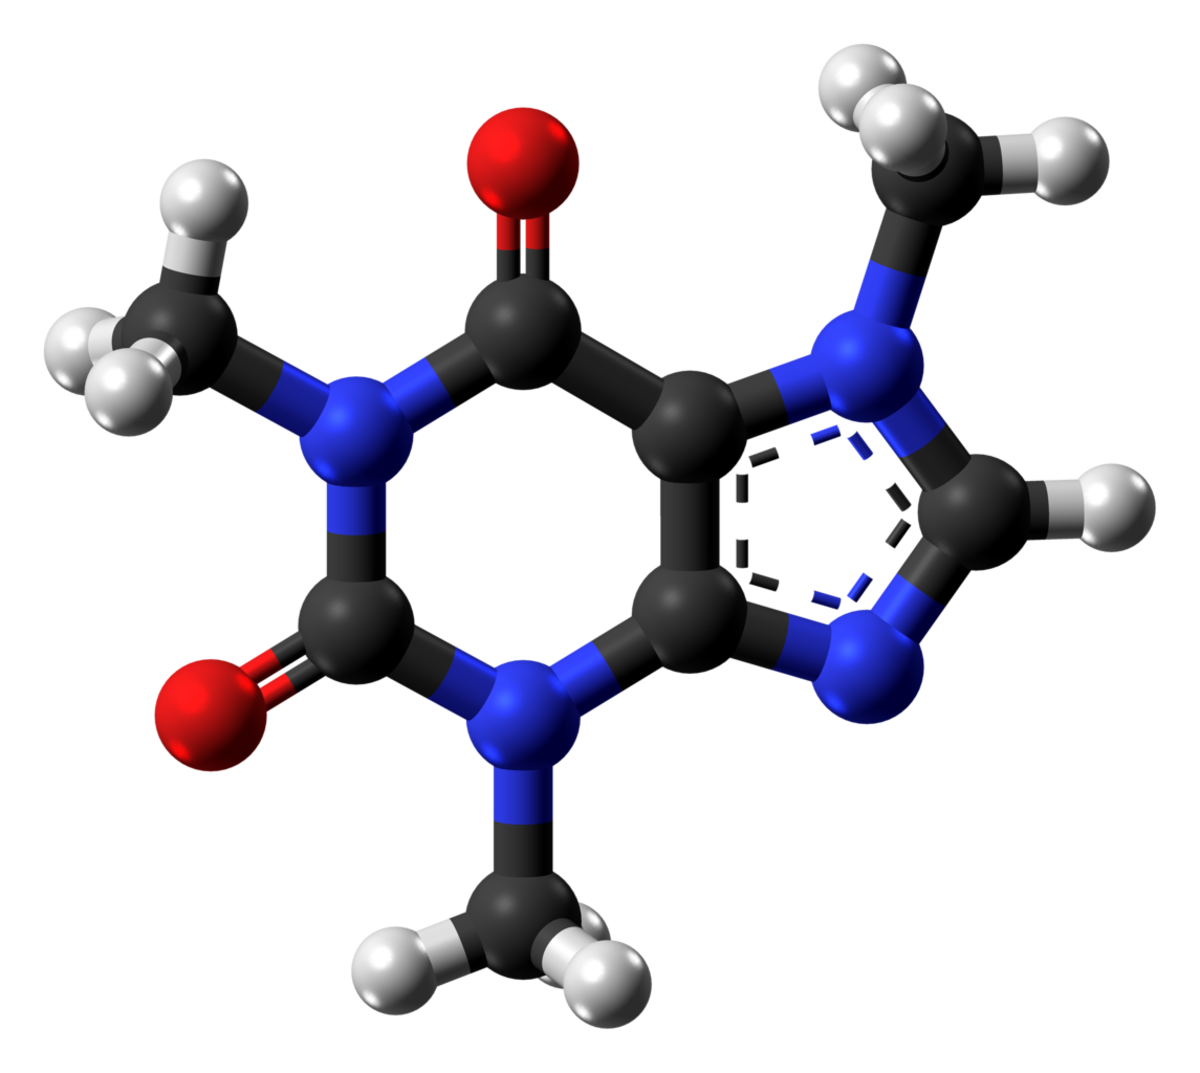 A ball-and-stick model of a caffeine molecule